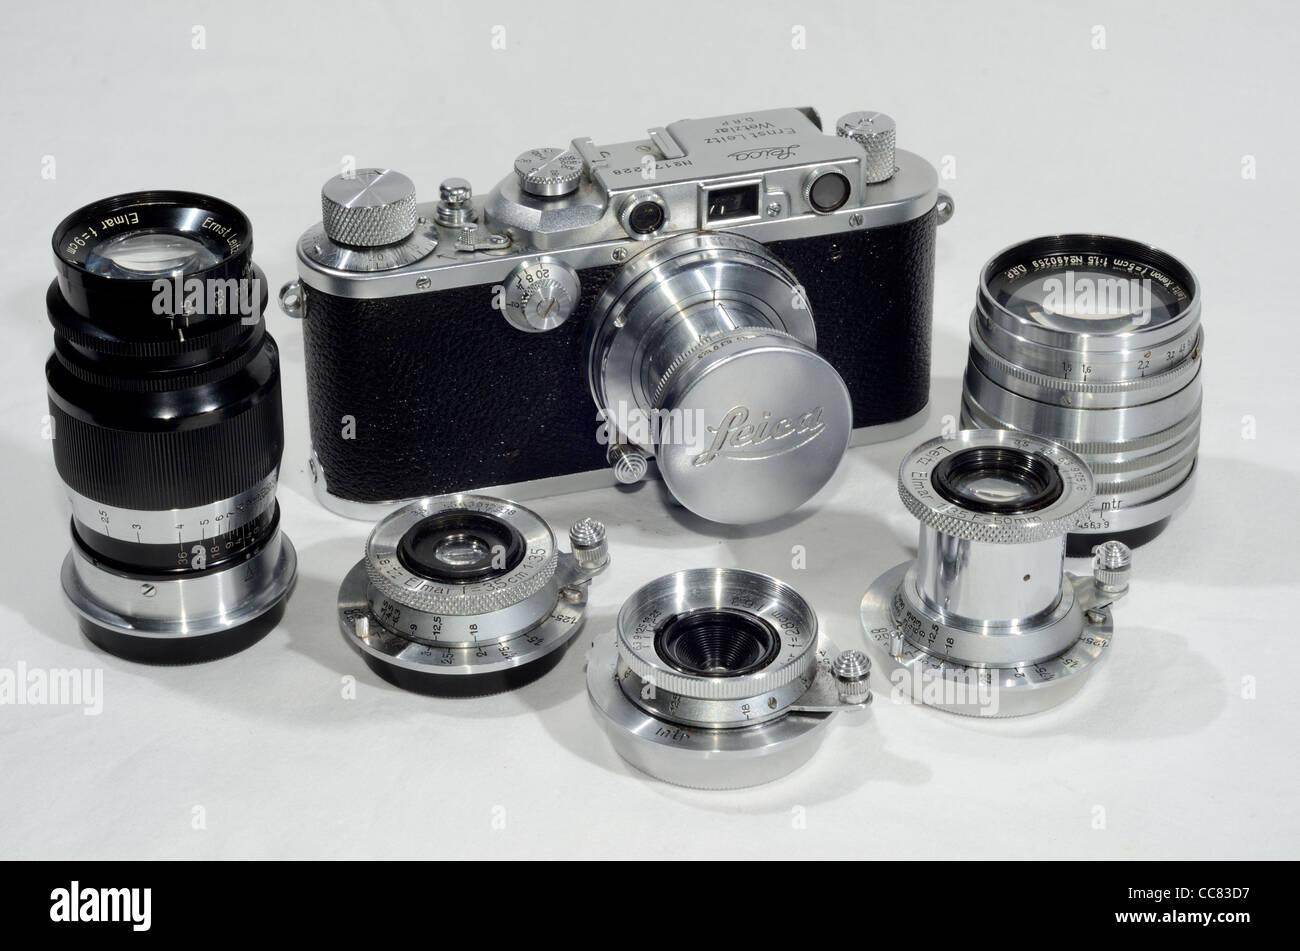 Leica Iii Entfernungsmesser : Leica geosystems disto d laser entfernungsmesser bluetooth